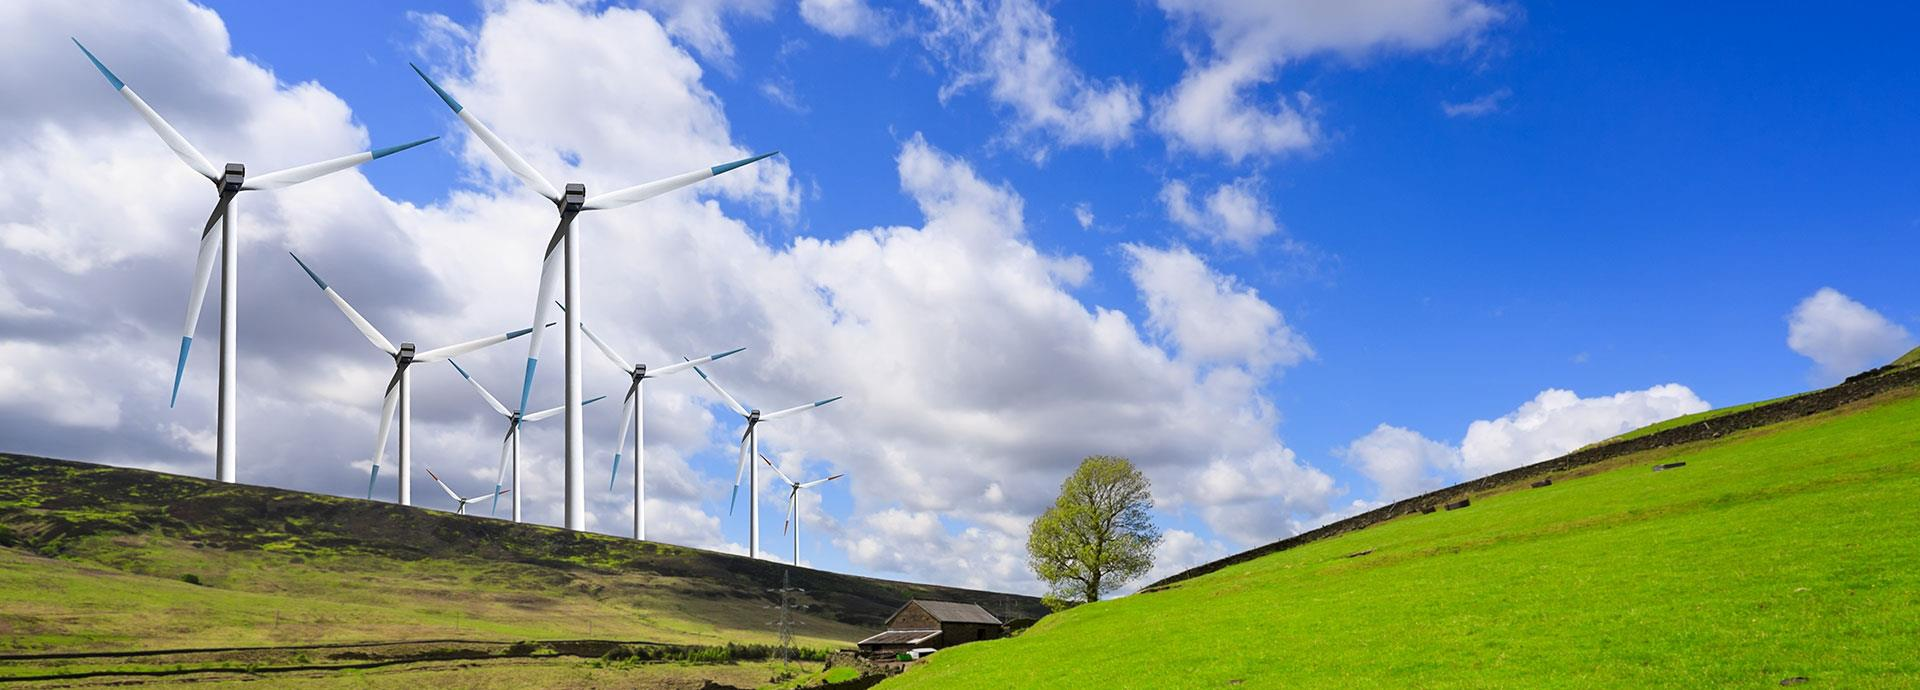 Utilising the full potential of Italy's renewable energy future